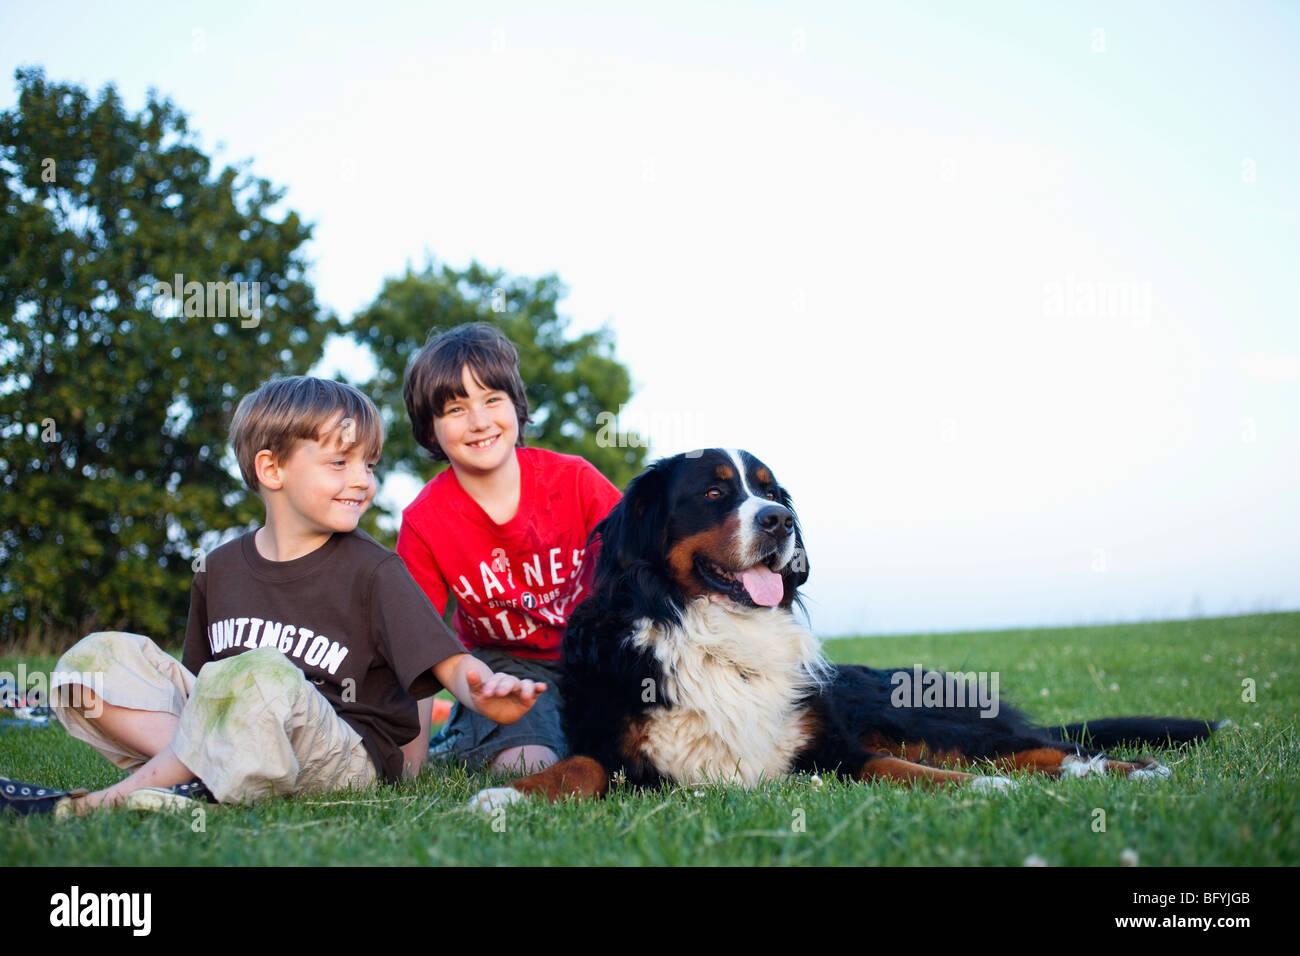 Deux garçons avec gros chien Photo Stock